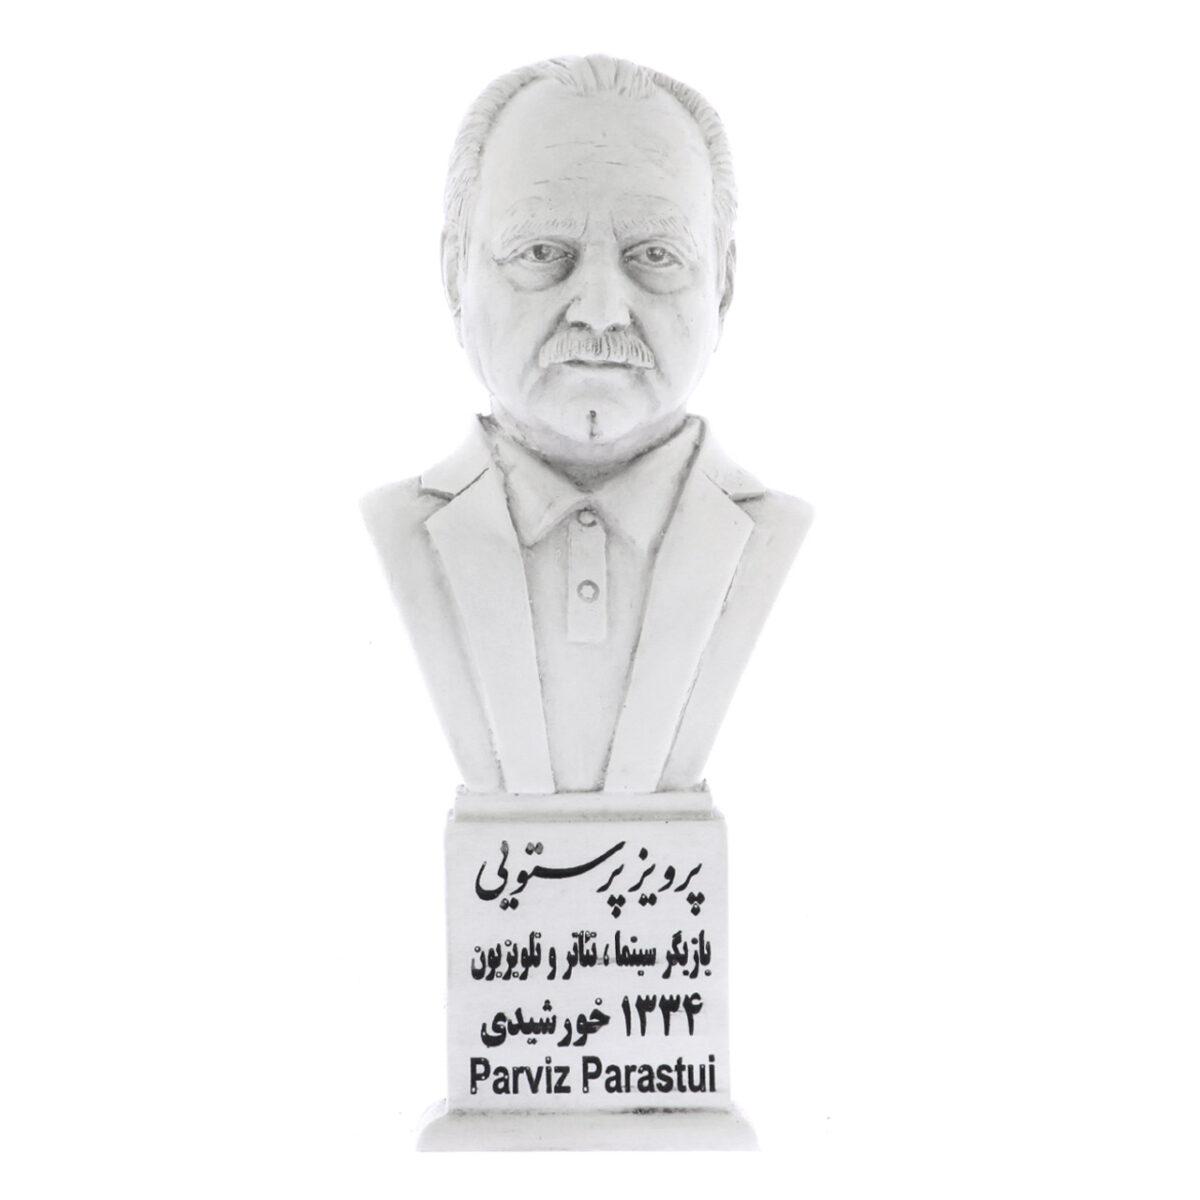 parviz parastoei s 1200x1200 - سردیس استاد پرویز پرستویی